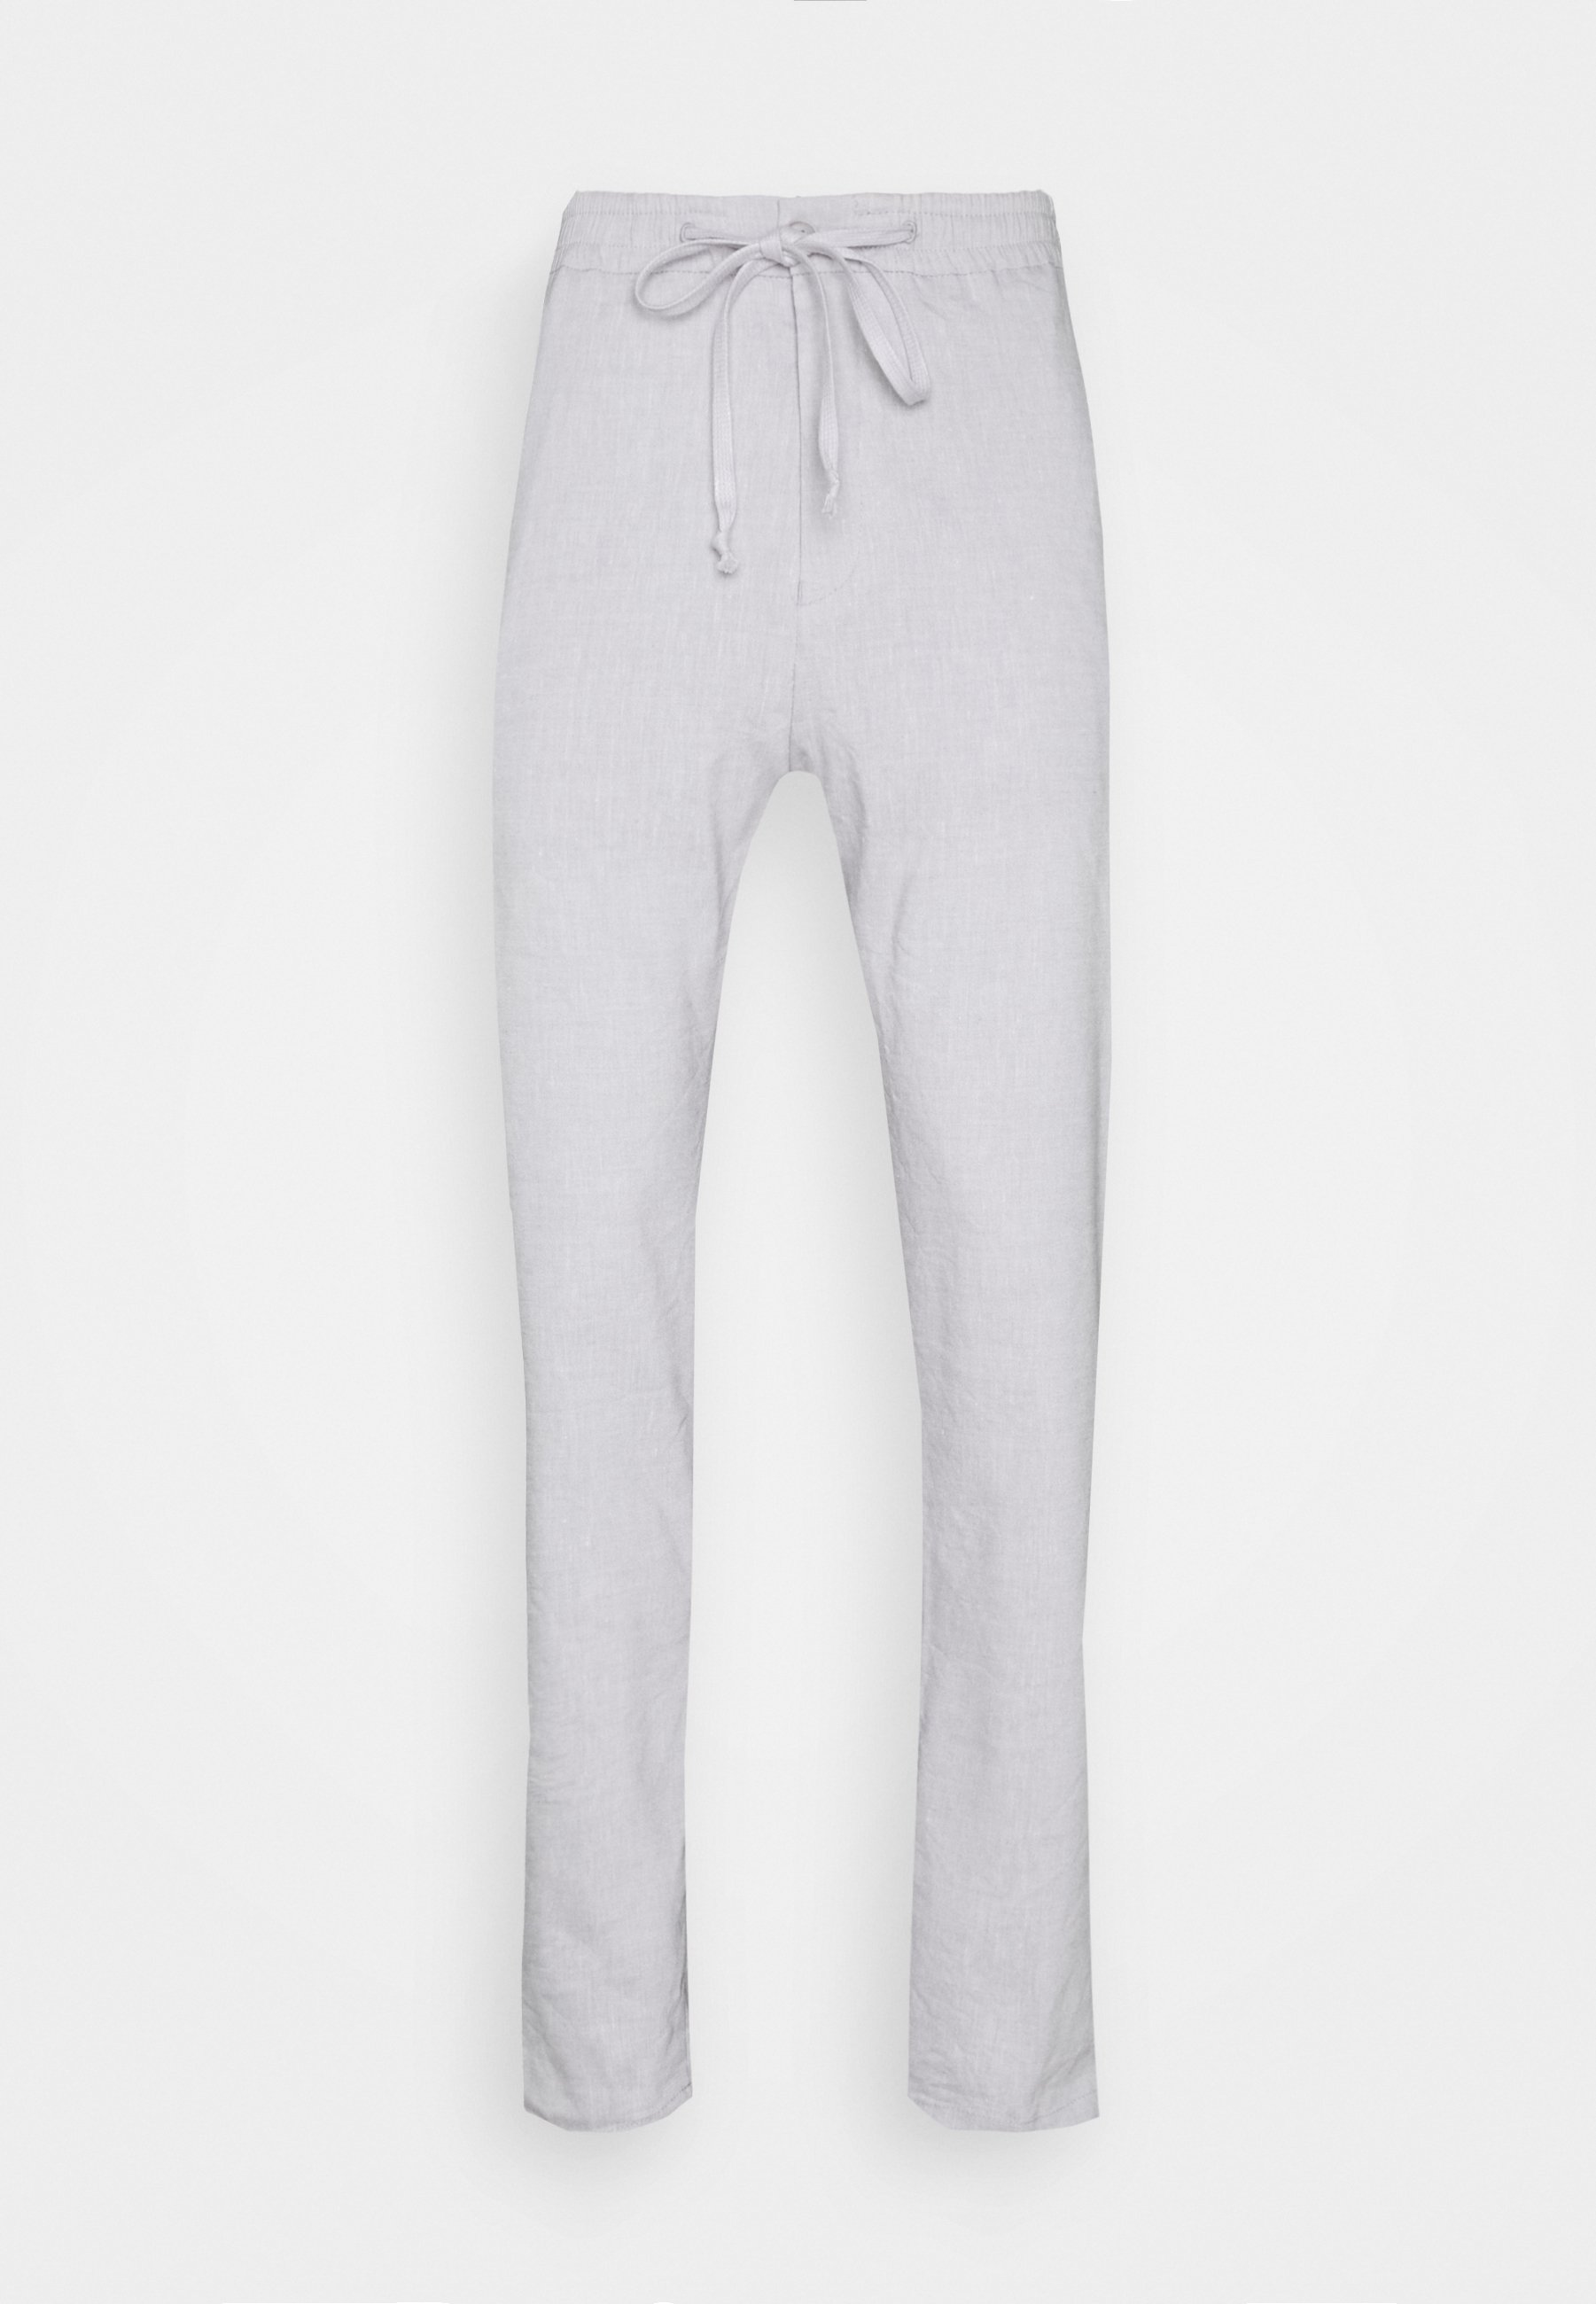 Uomo JEGER - Pantaloni